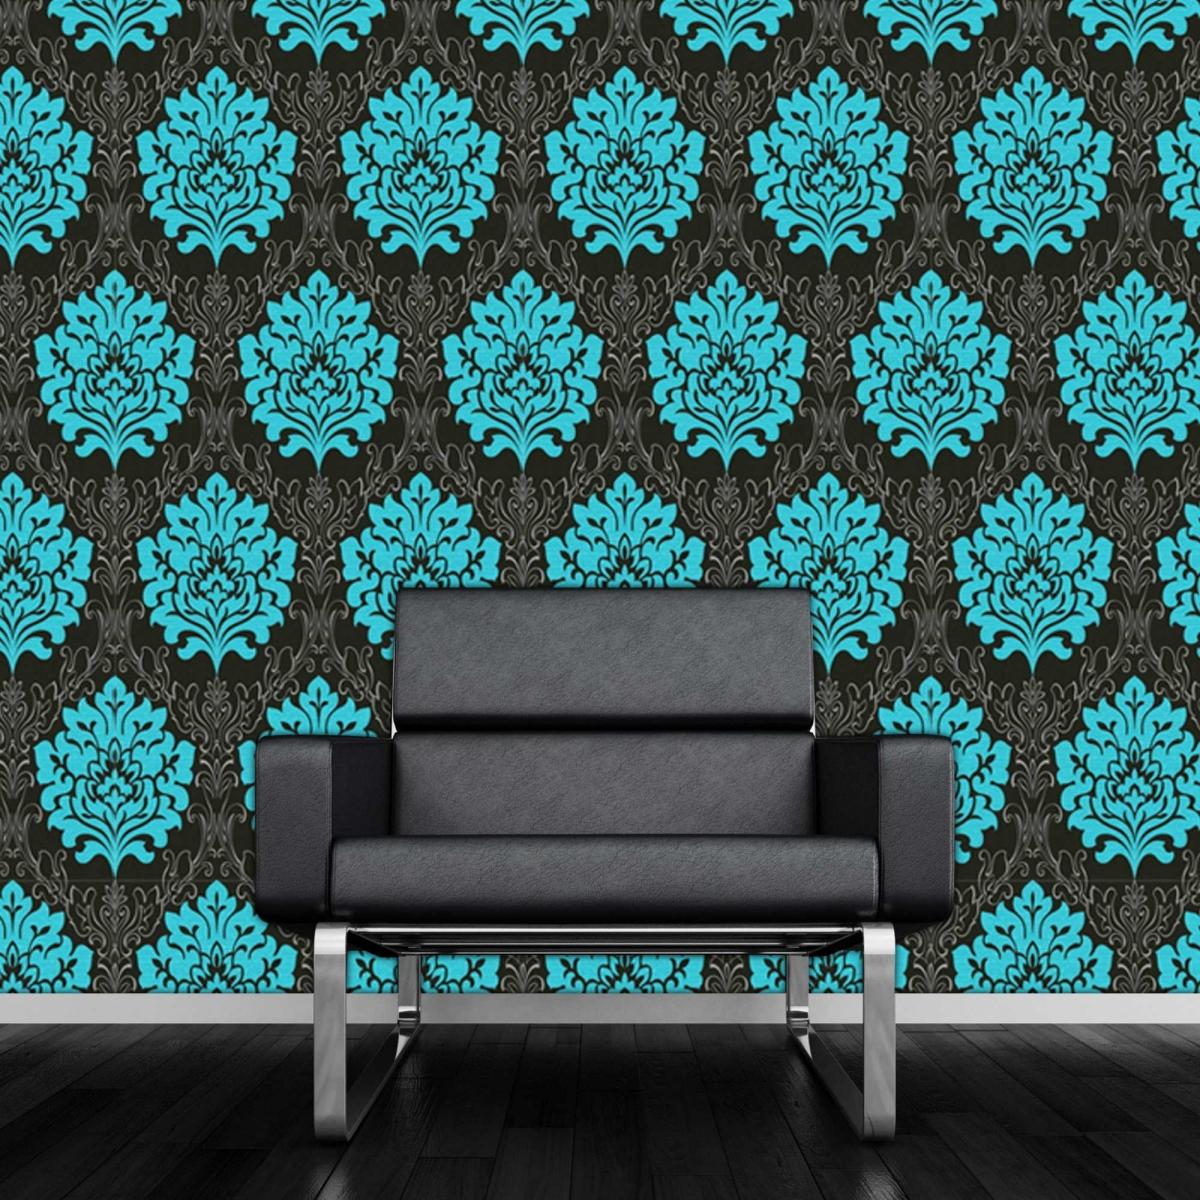 Shop By Style Damask Marrakesh Teal Black Damask Wallpaper 1200x1200